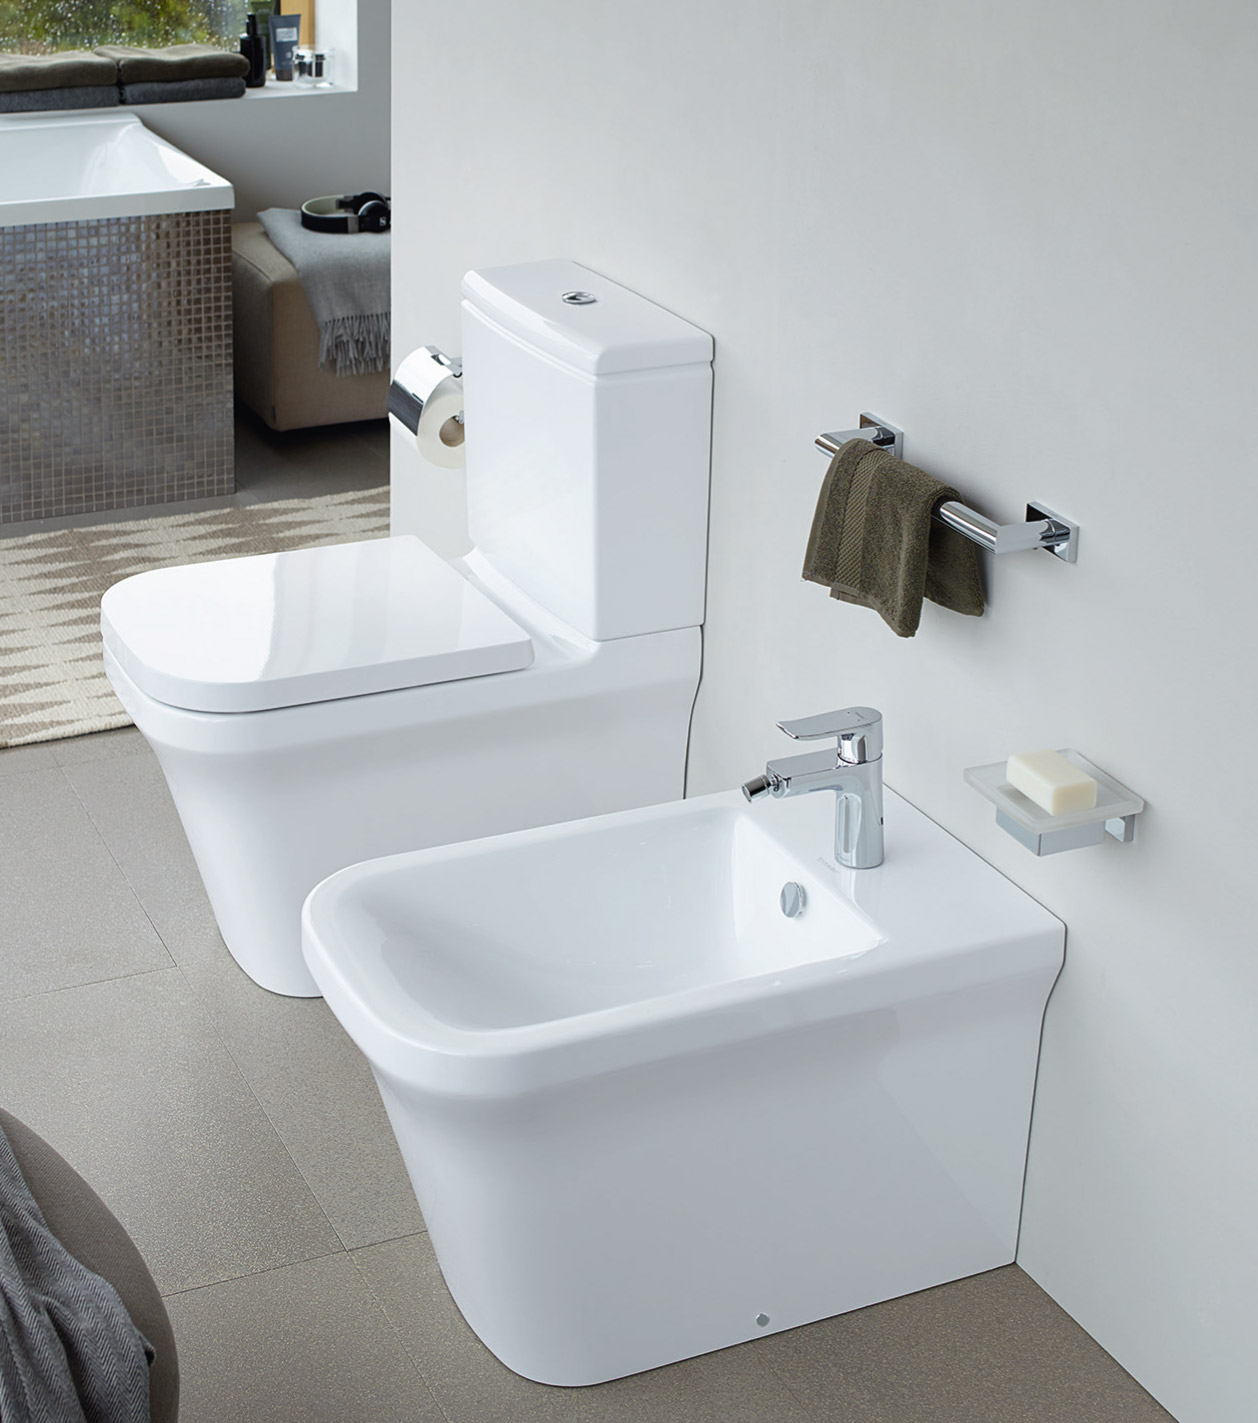 p3 comforts duravit. Black Bedroom Furniture Sets. Home Design Ideas